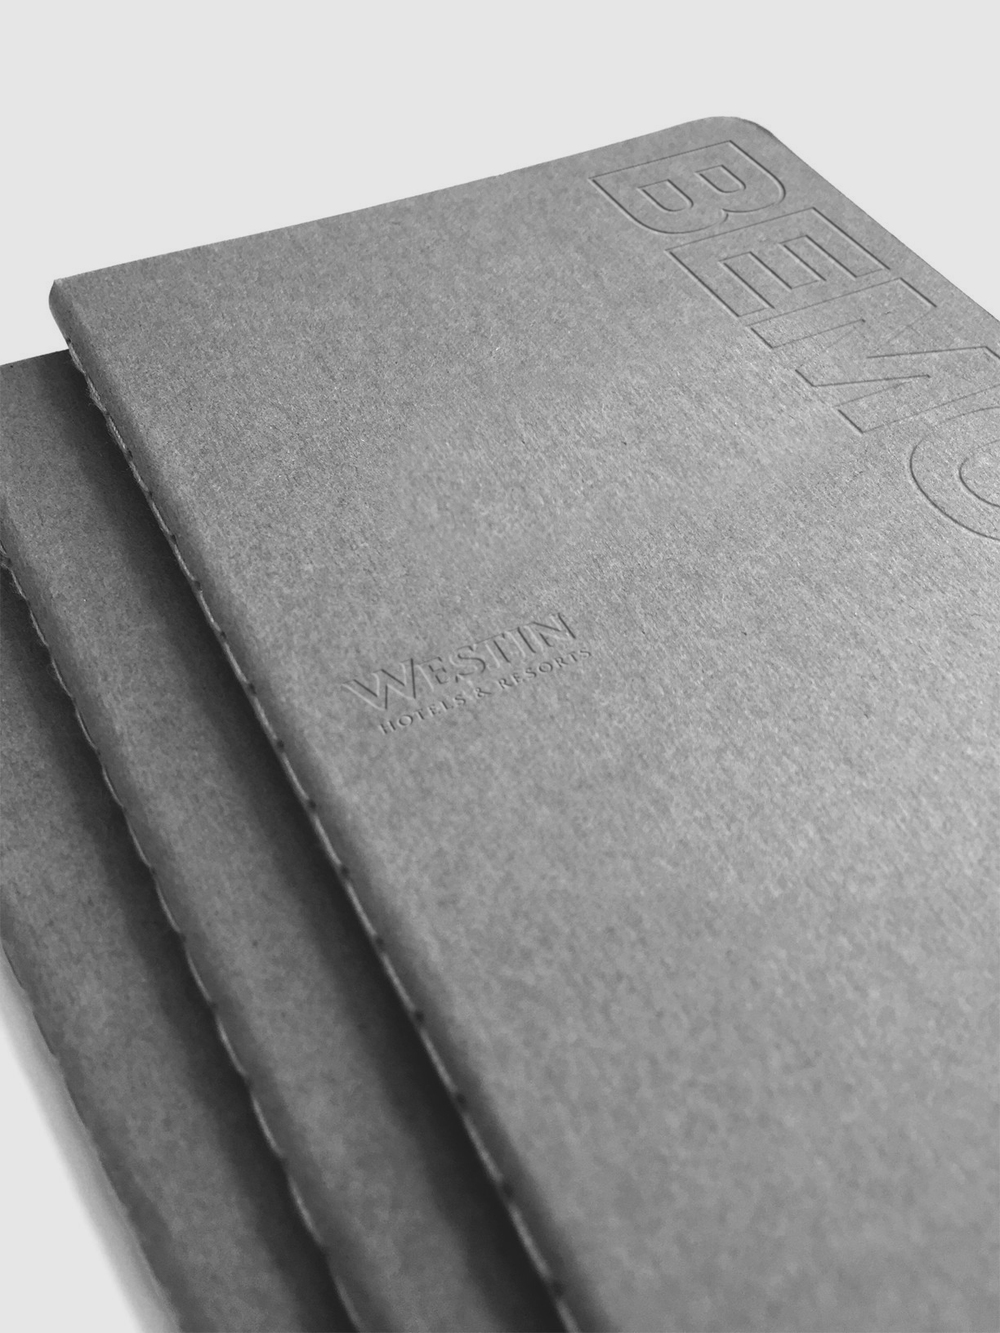 notebook copy.jpg